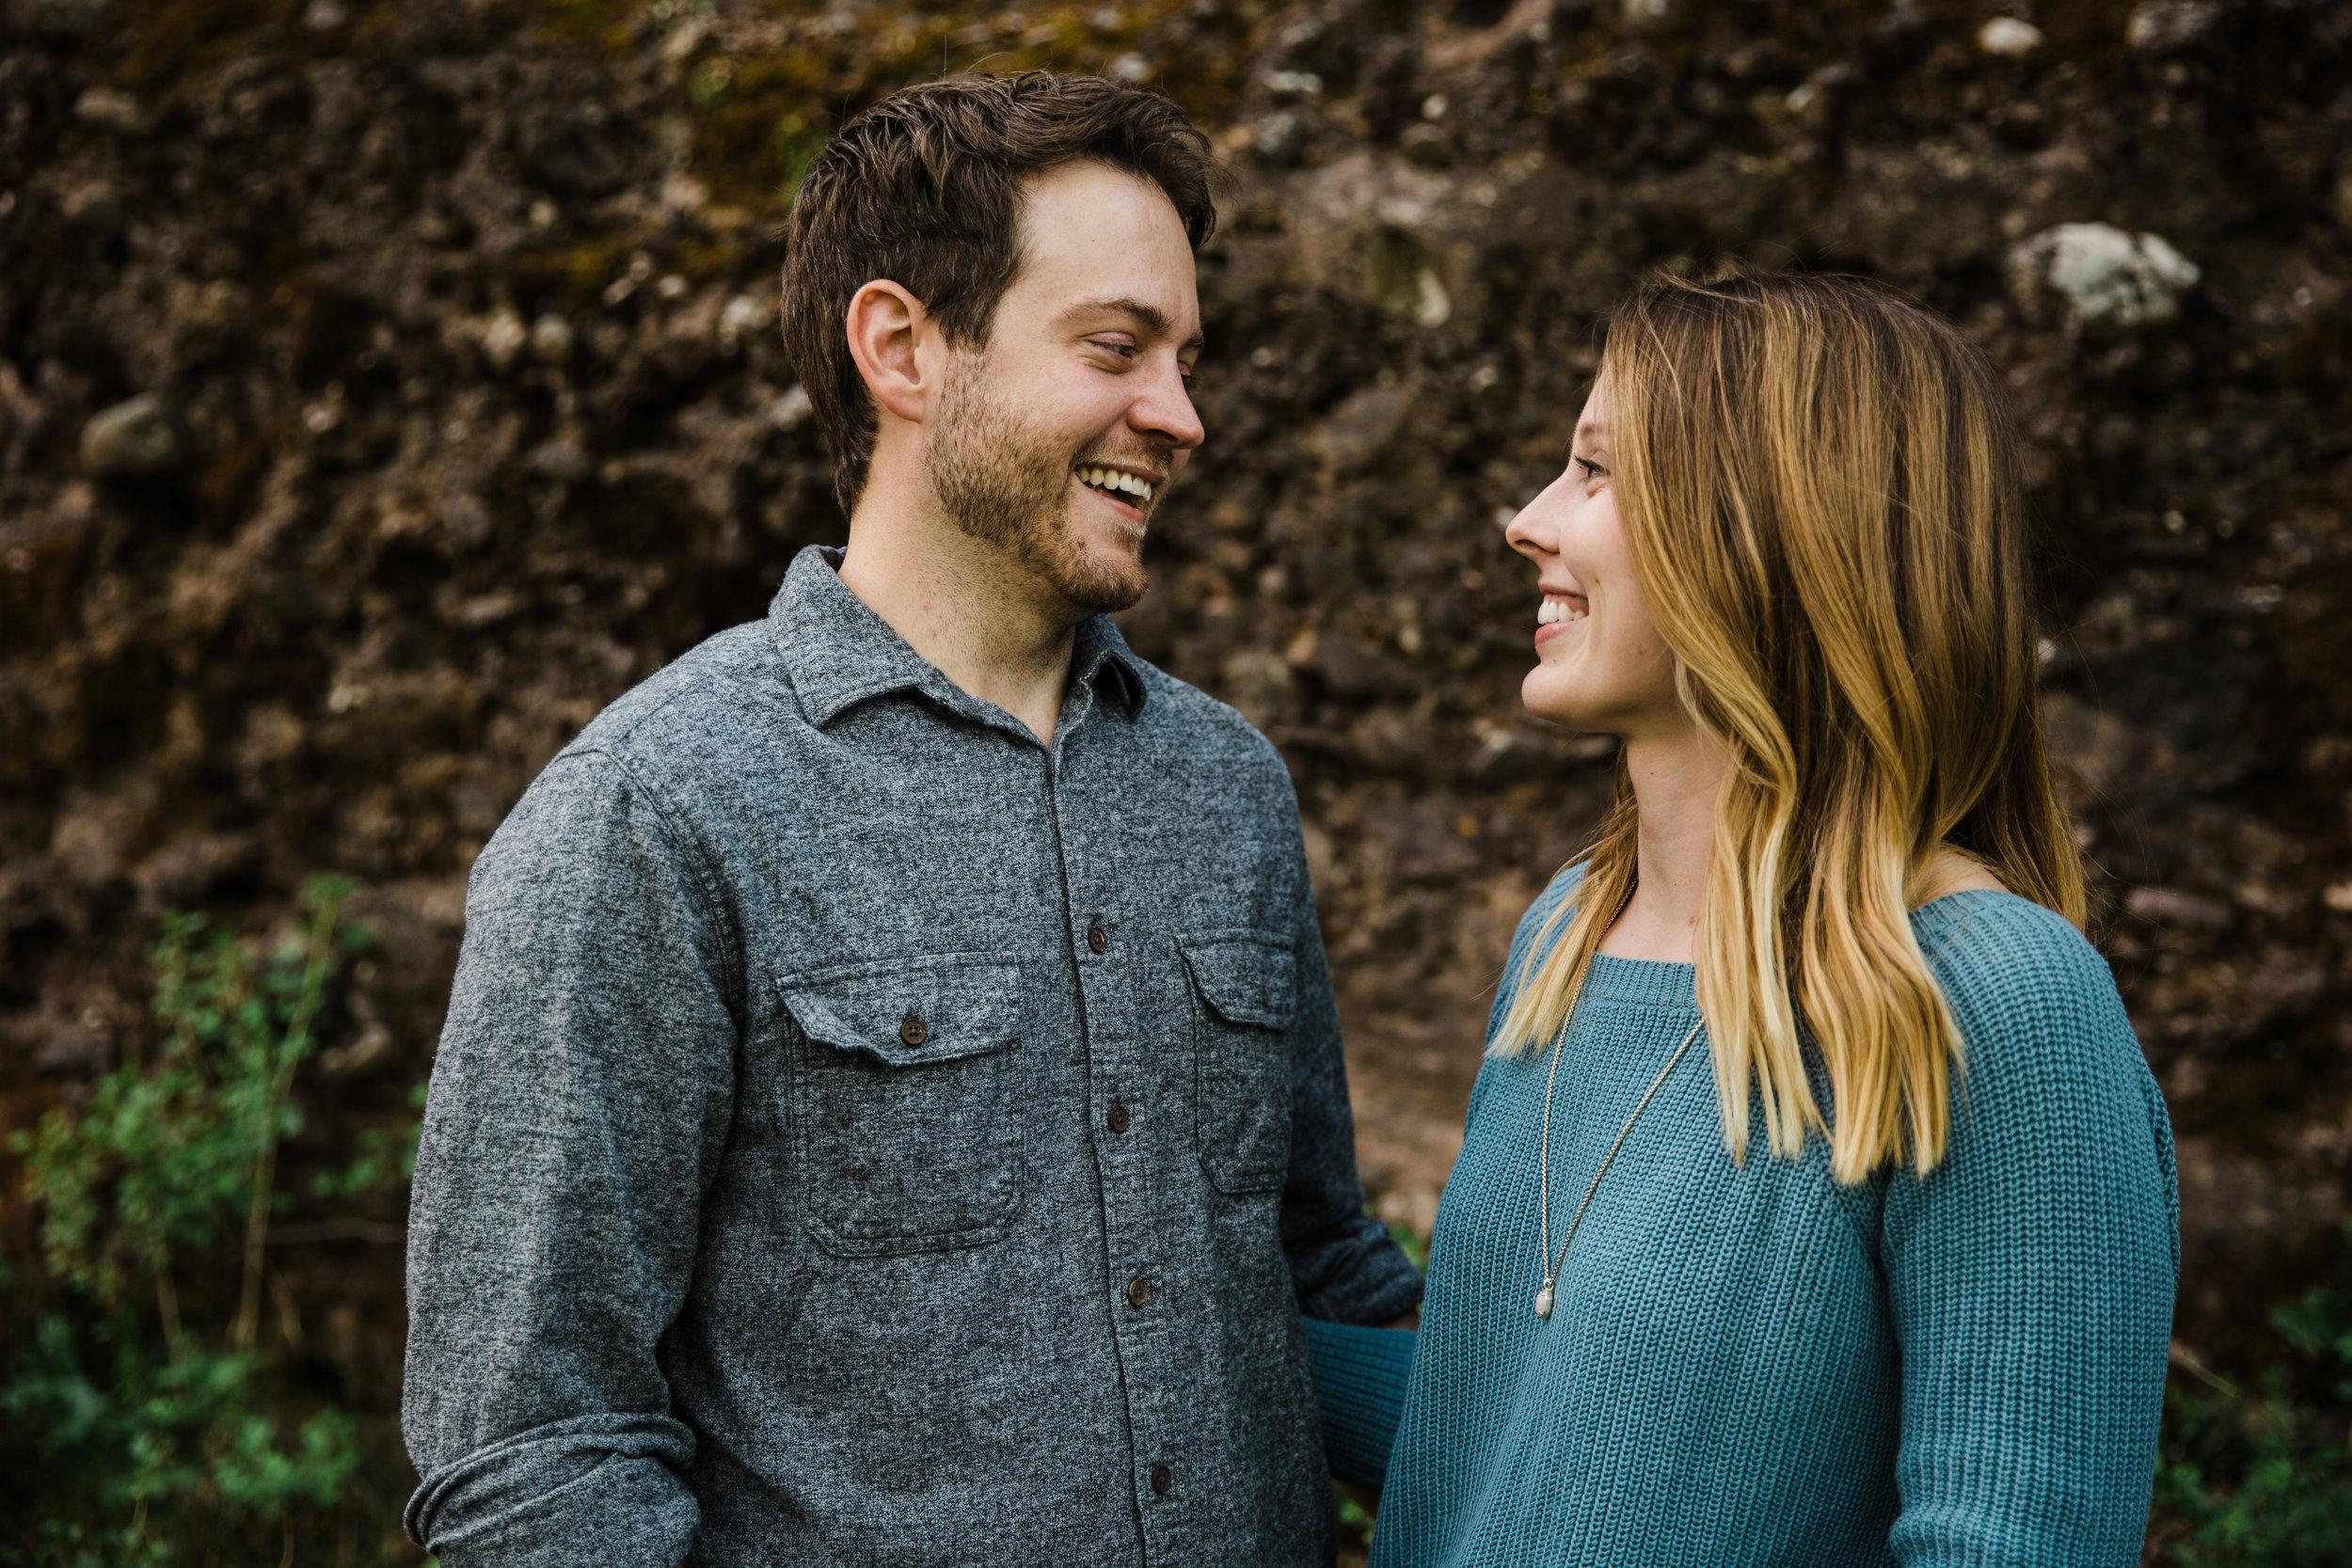 JB-Telluride-Engagement-Photography-Leahandashton-1.jpg